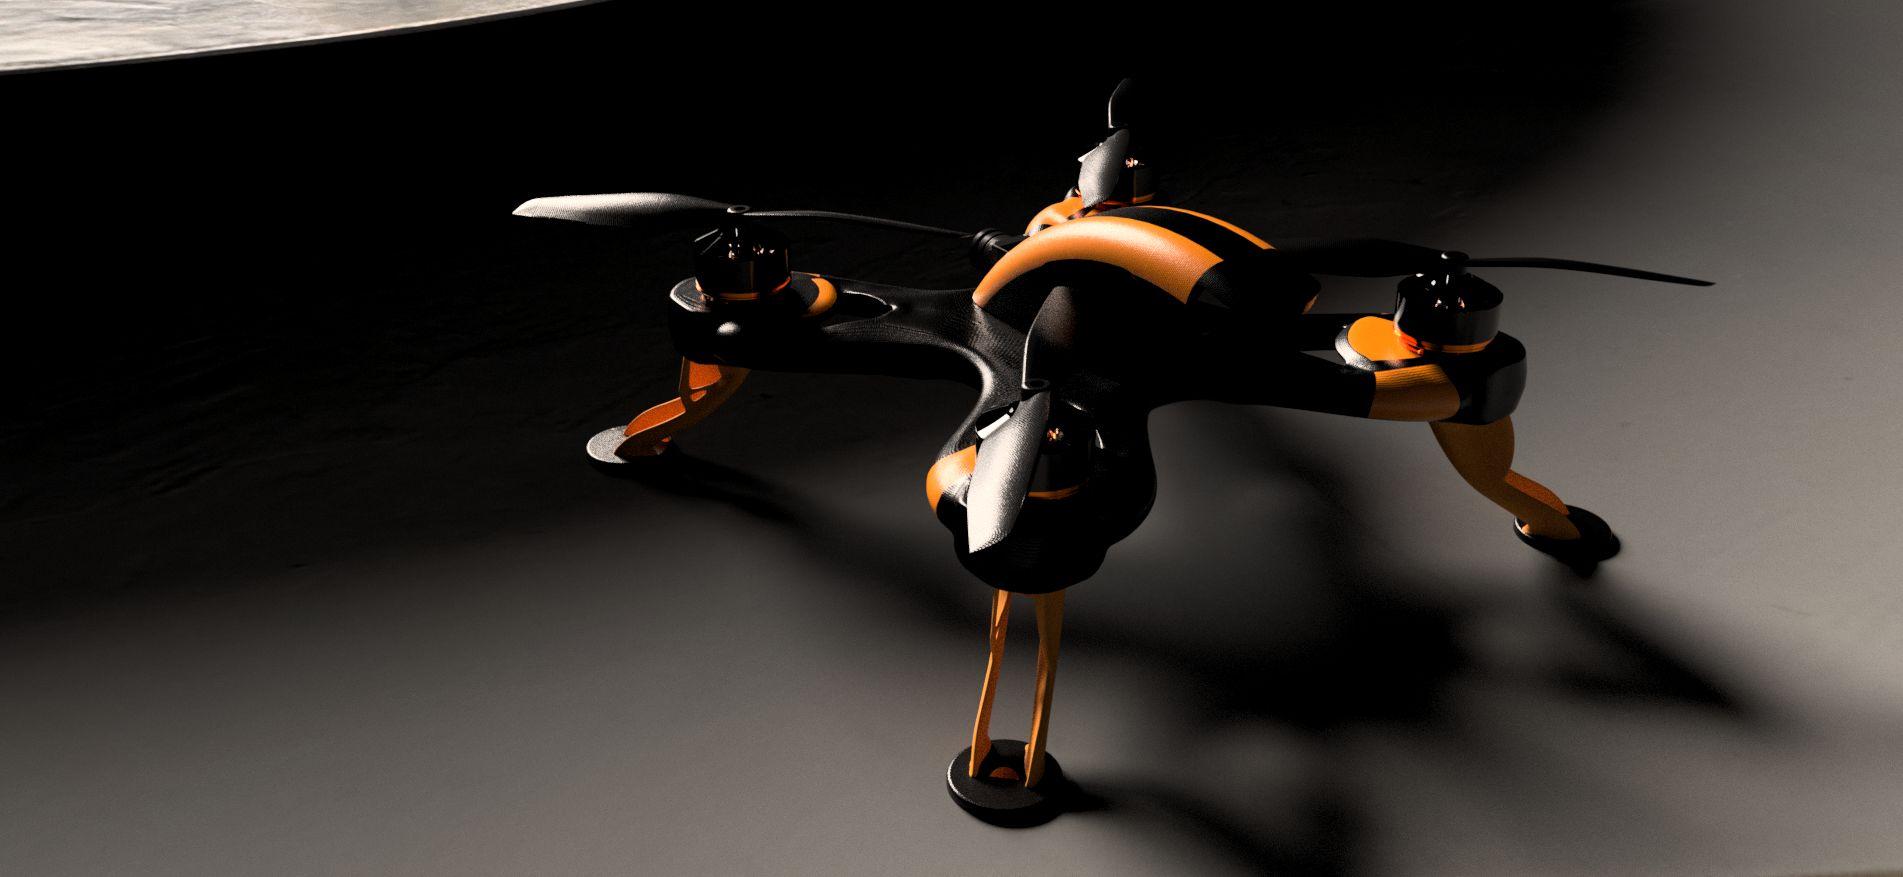 Drone-plano-v4-3-3500-3500